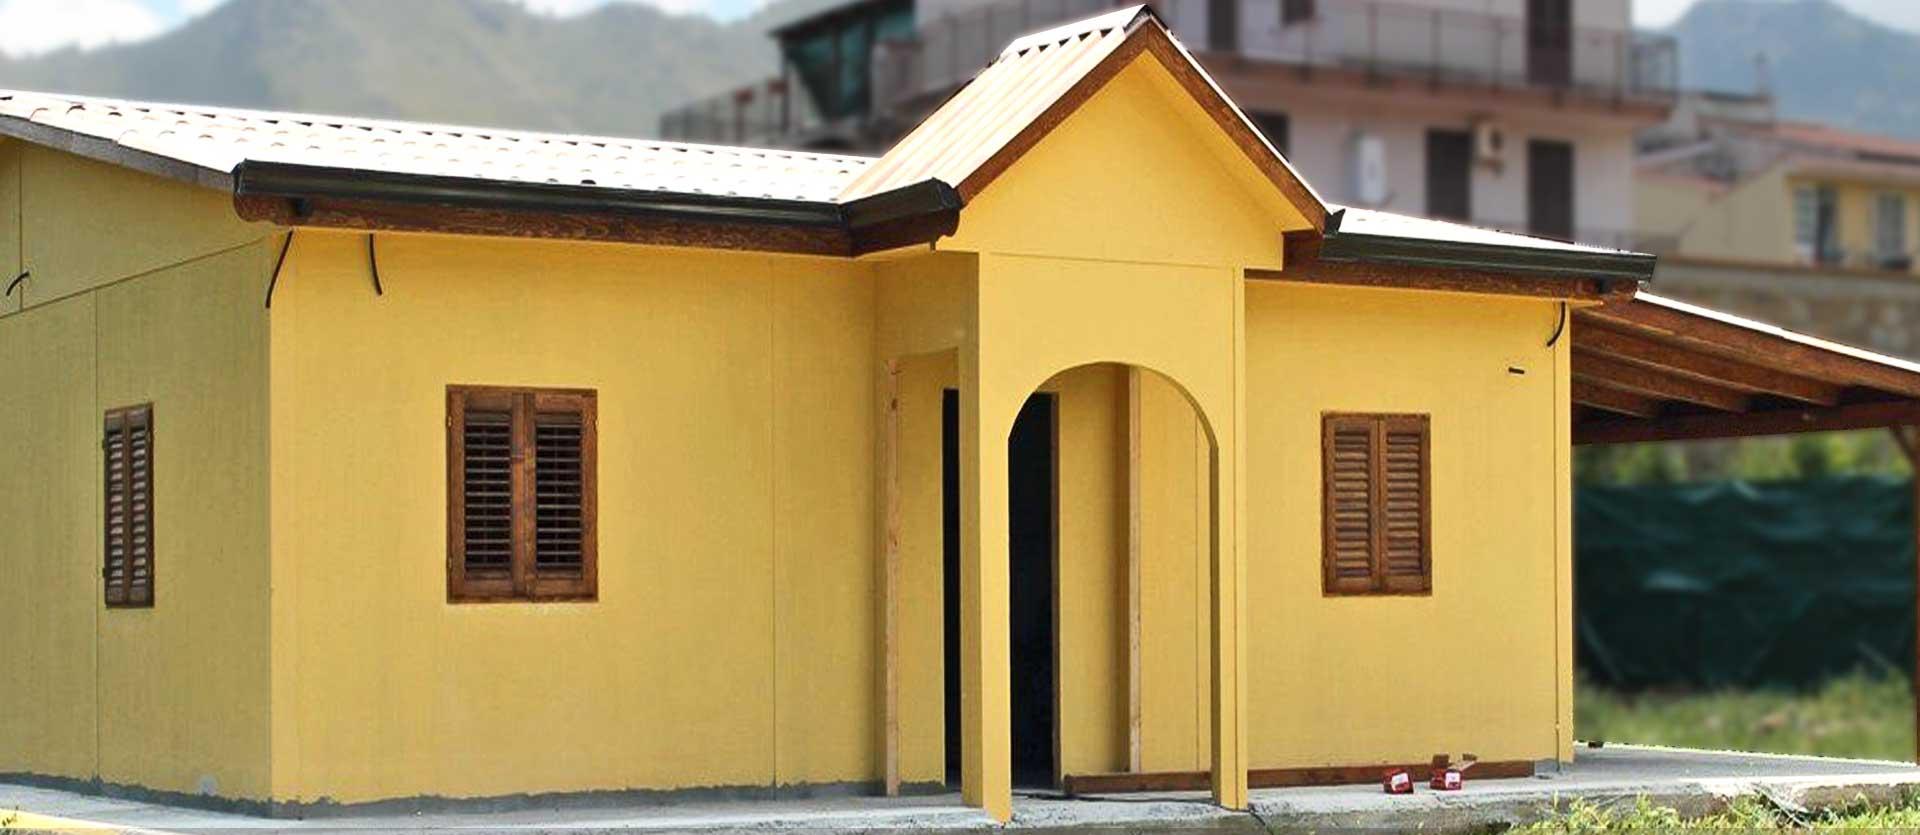 Case in legno per civile abitazione